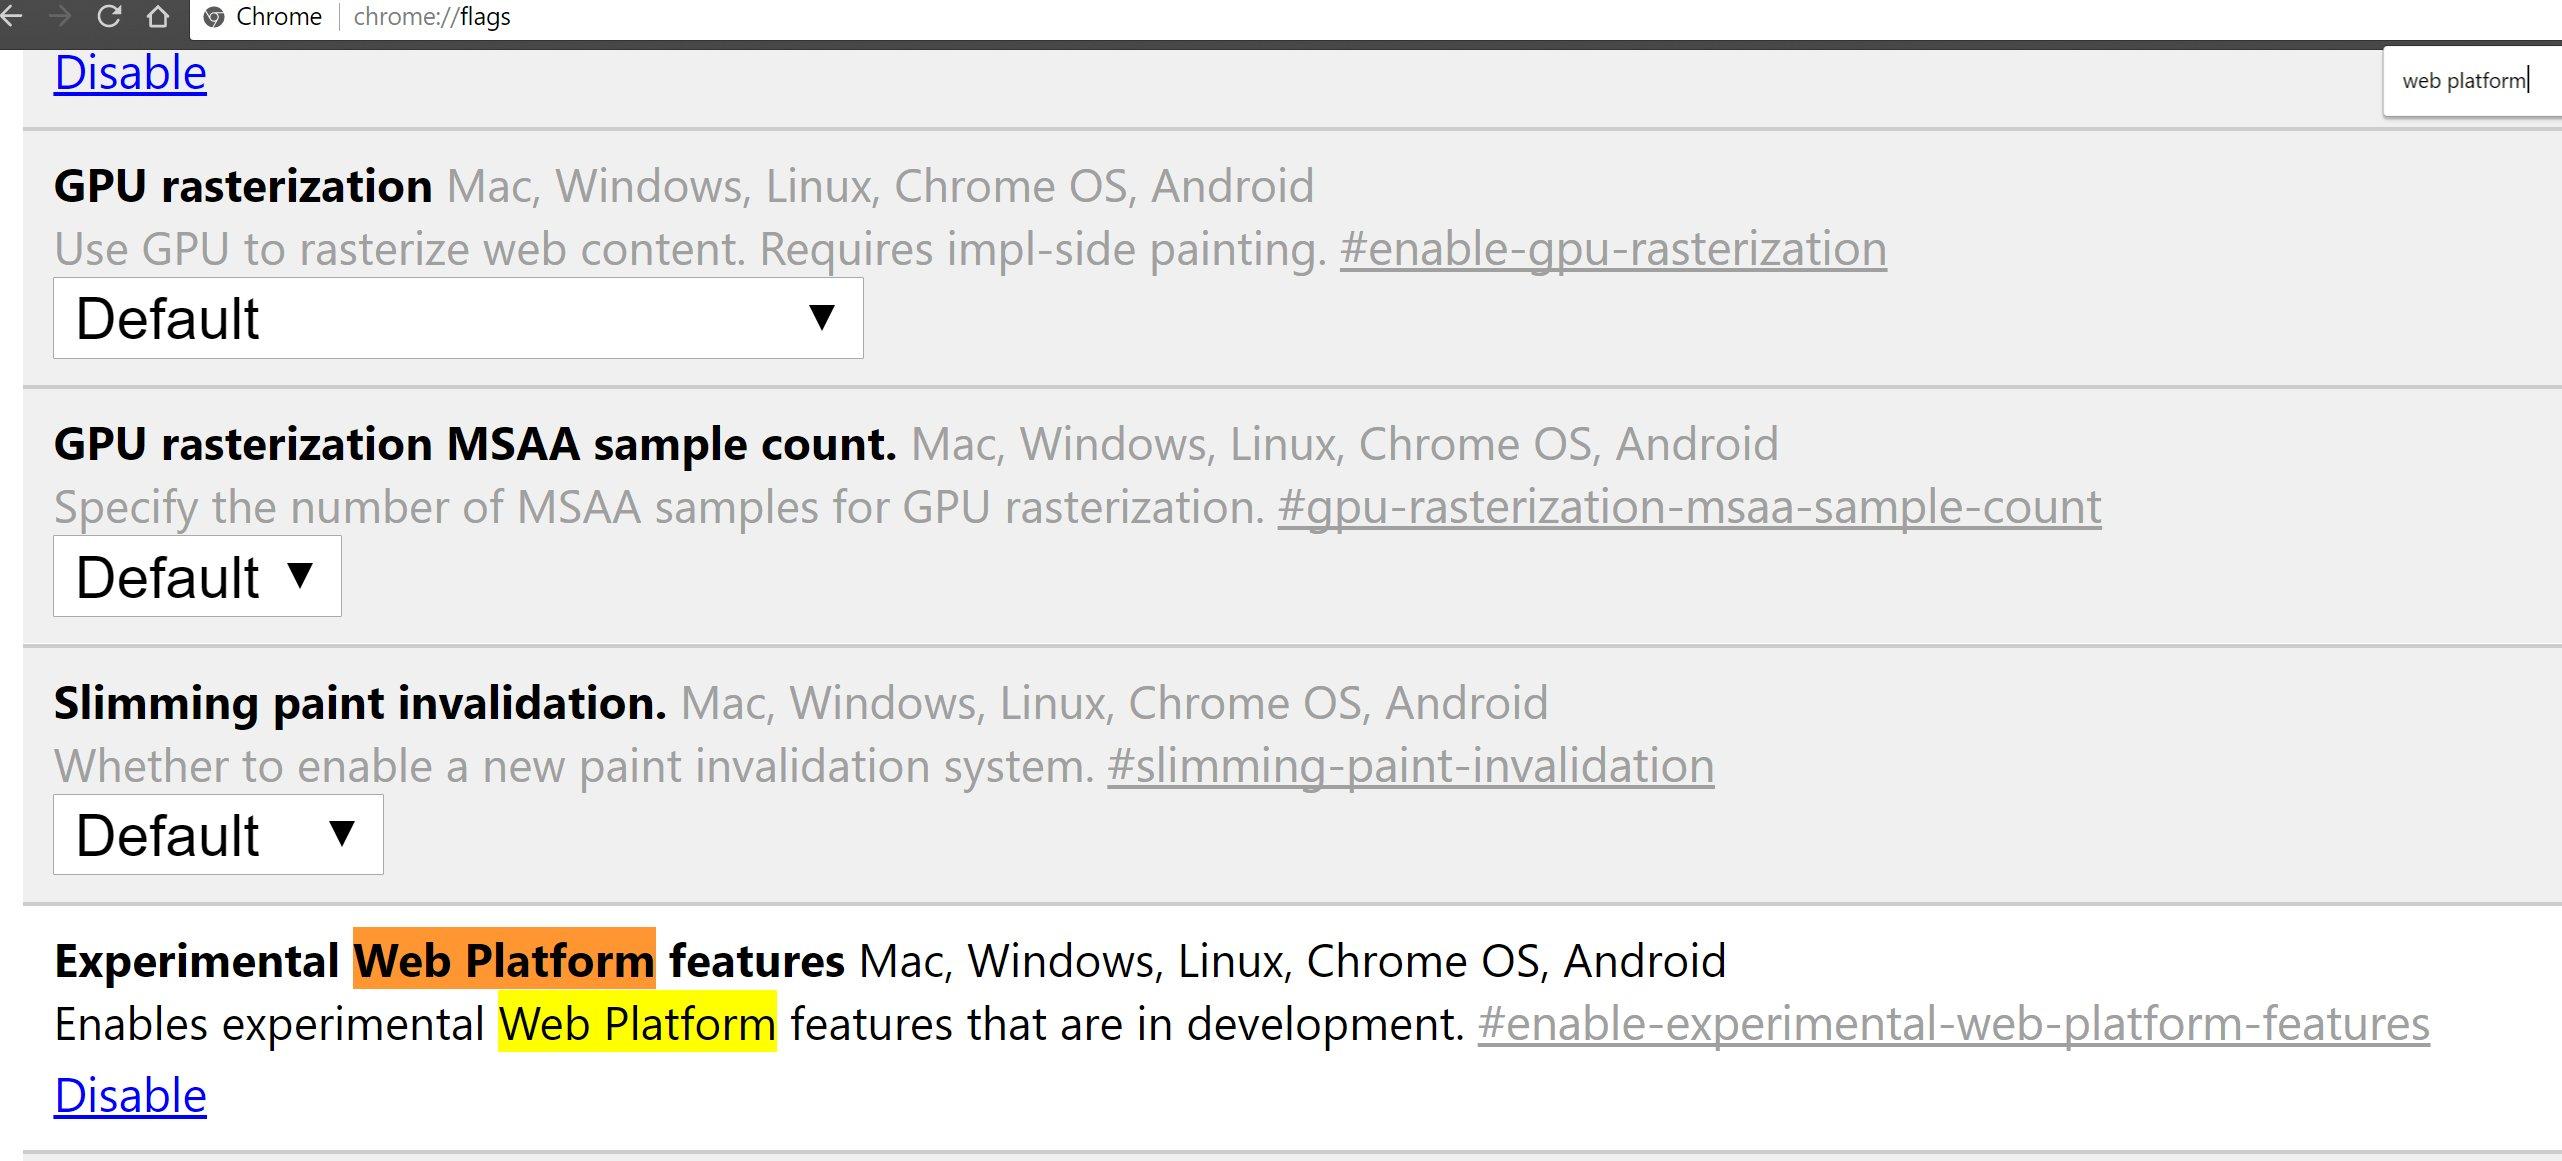 enabling the flag in Chrome